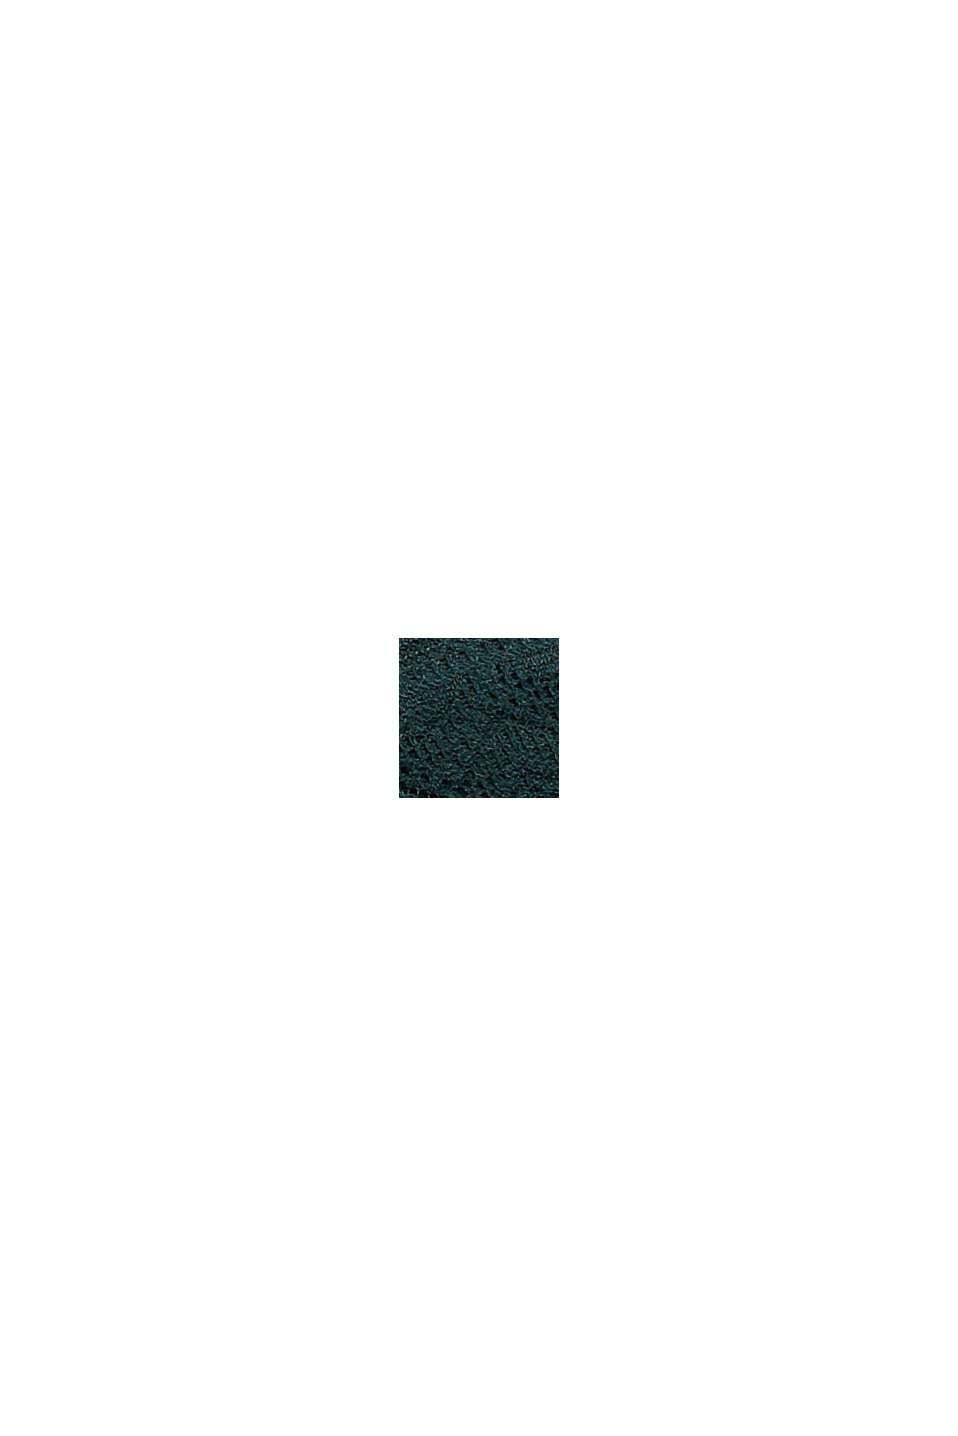 In materiale riciclato: culotte corte in pizzo, DARK TEAL GREEN, swatch